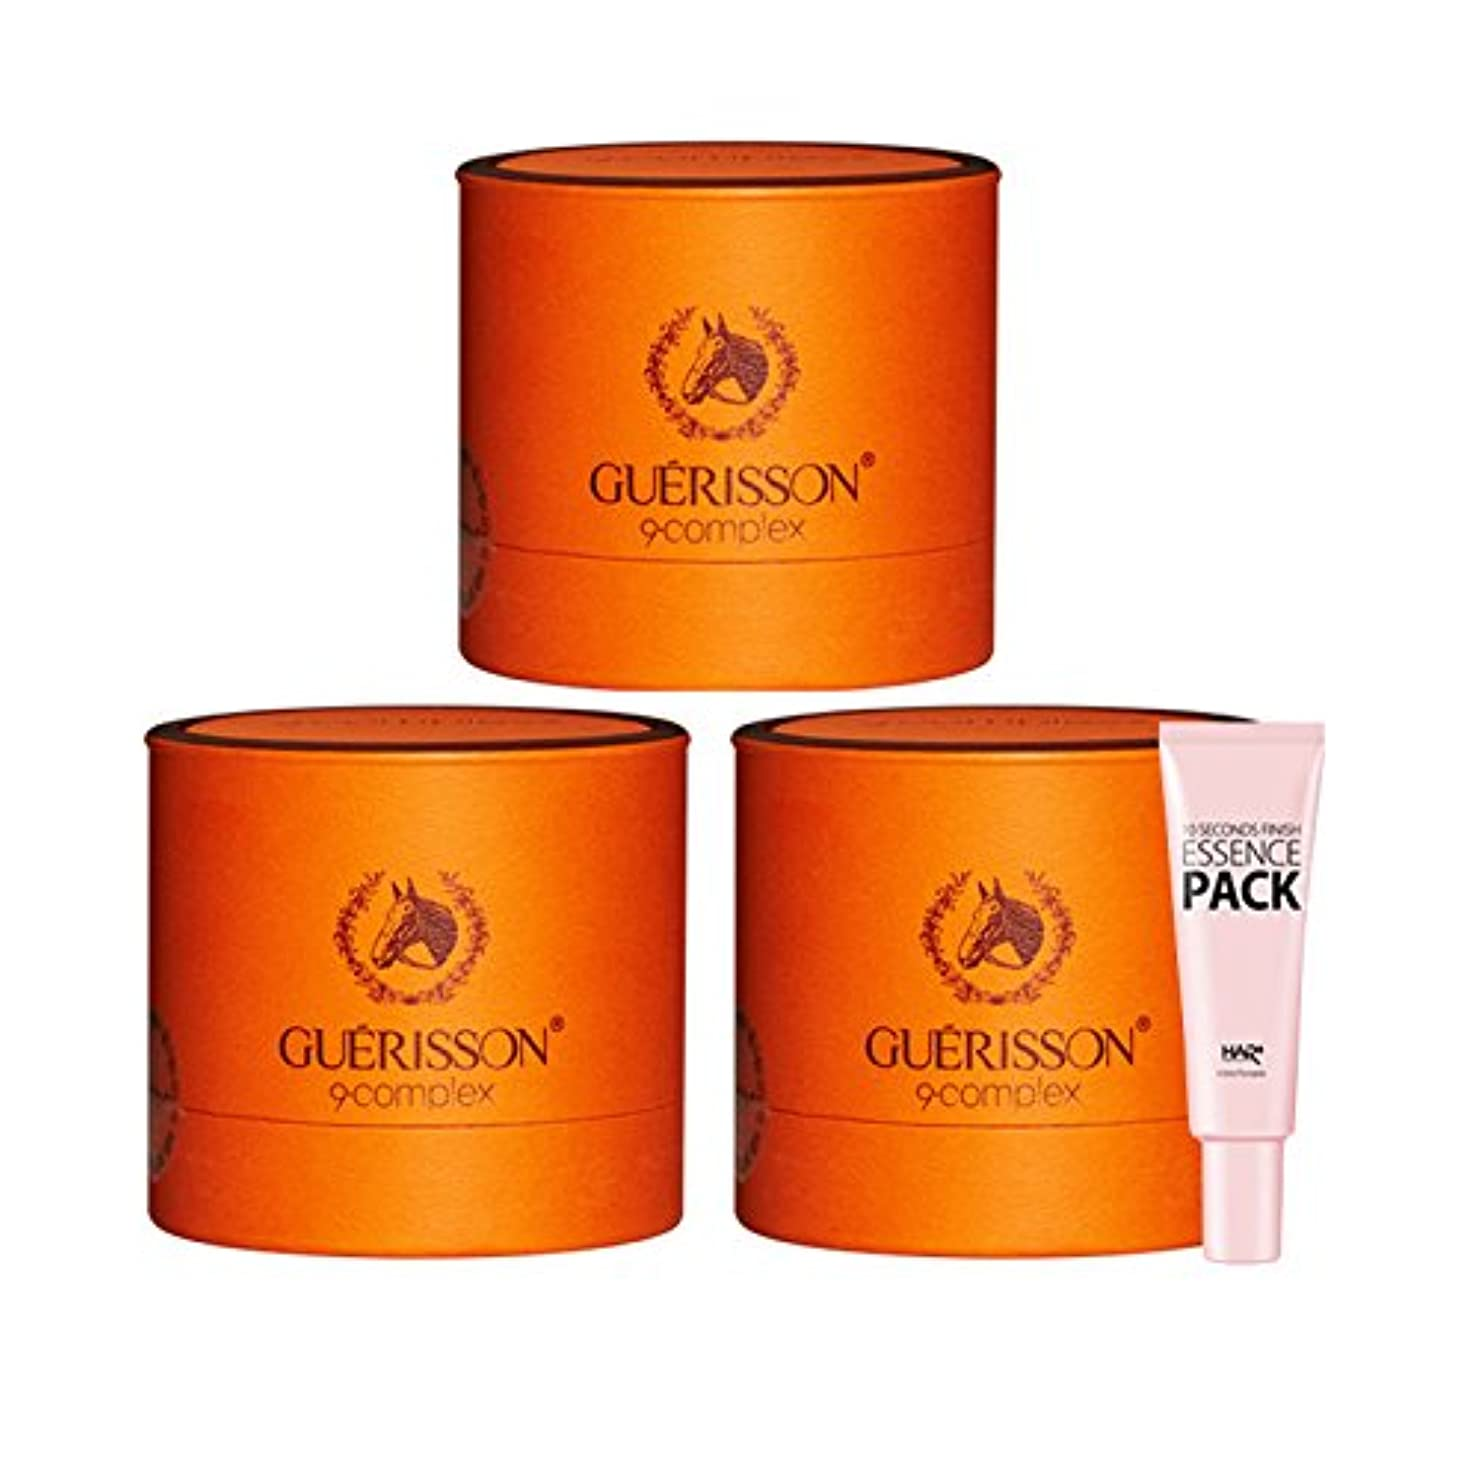 GUERISSON ゲリソン 9?complex 馬油クリーム 70g x 3個 (9 Complex Moisturizing Scar Cream Horse Oil Wrinkle Care) +ヘアプラスエッセンスパック...